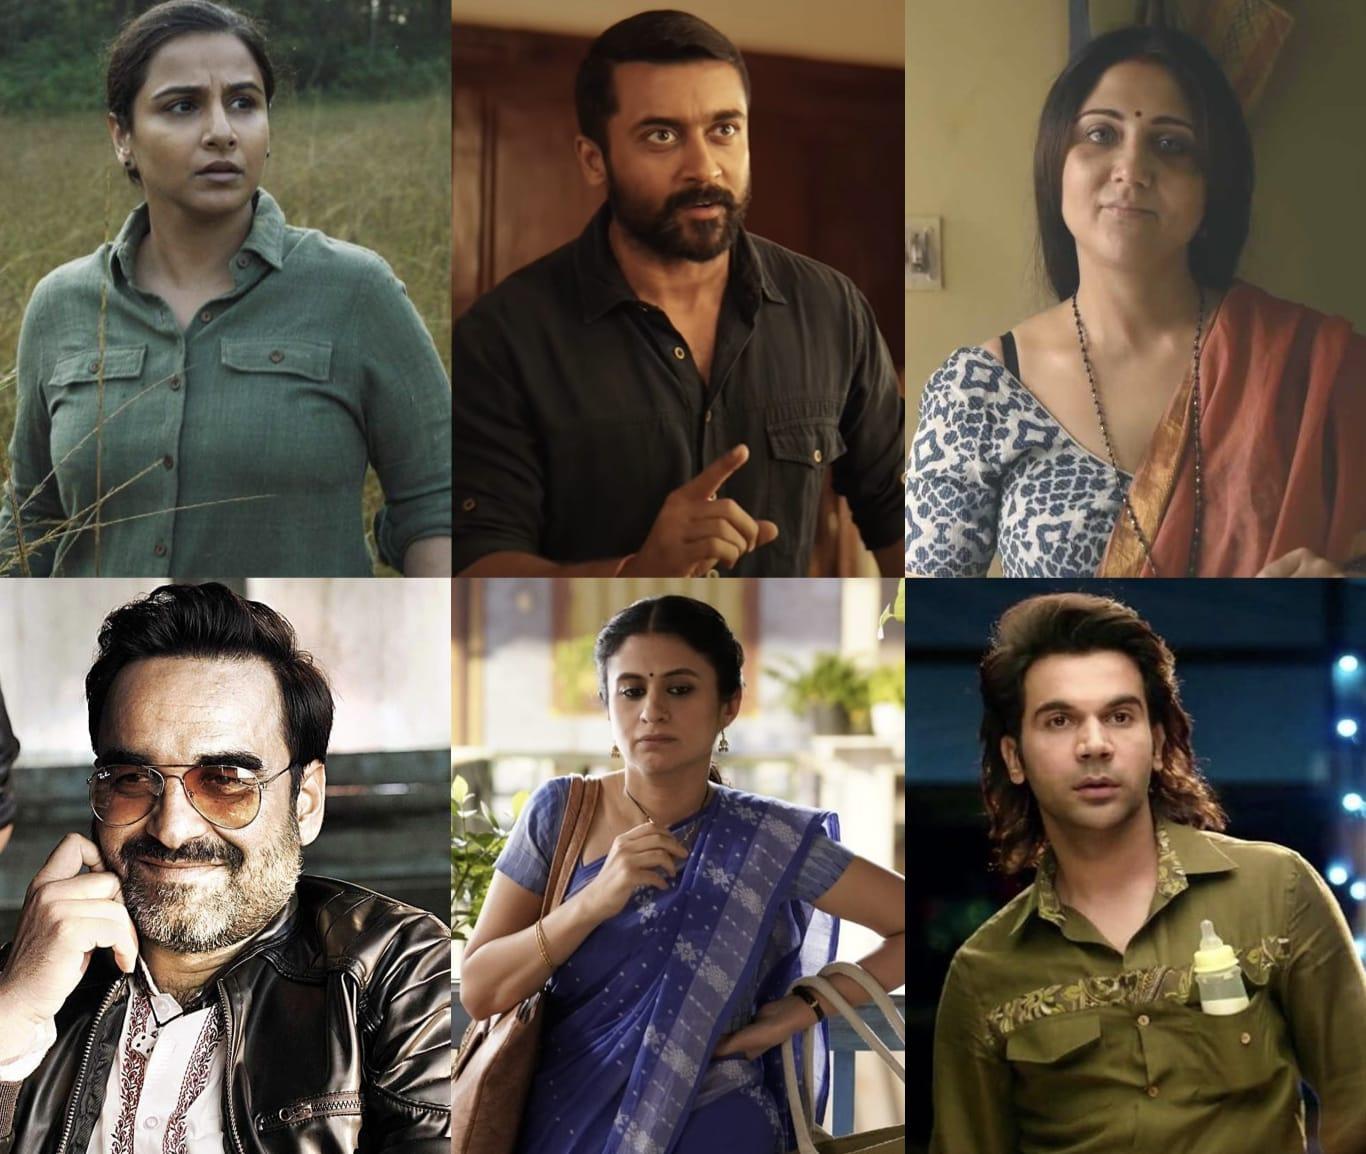 Indian Film Festival of Melbourne 2021